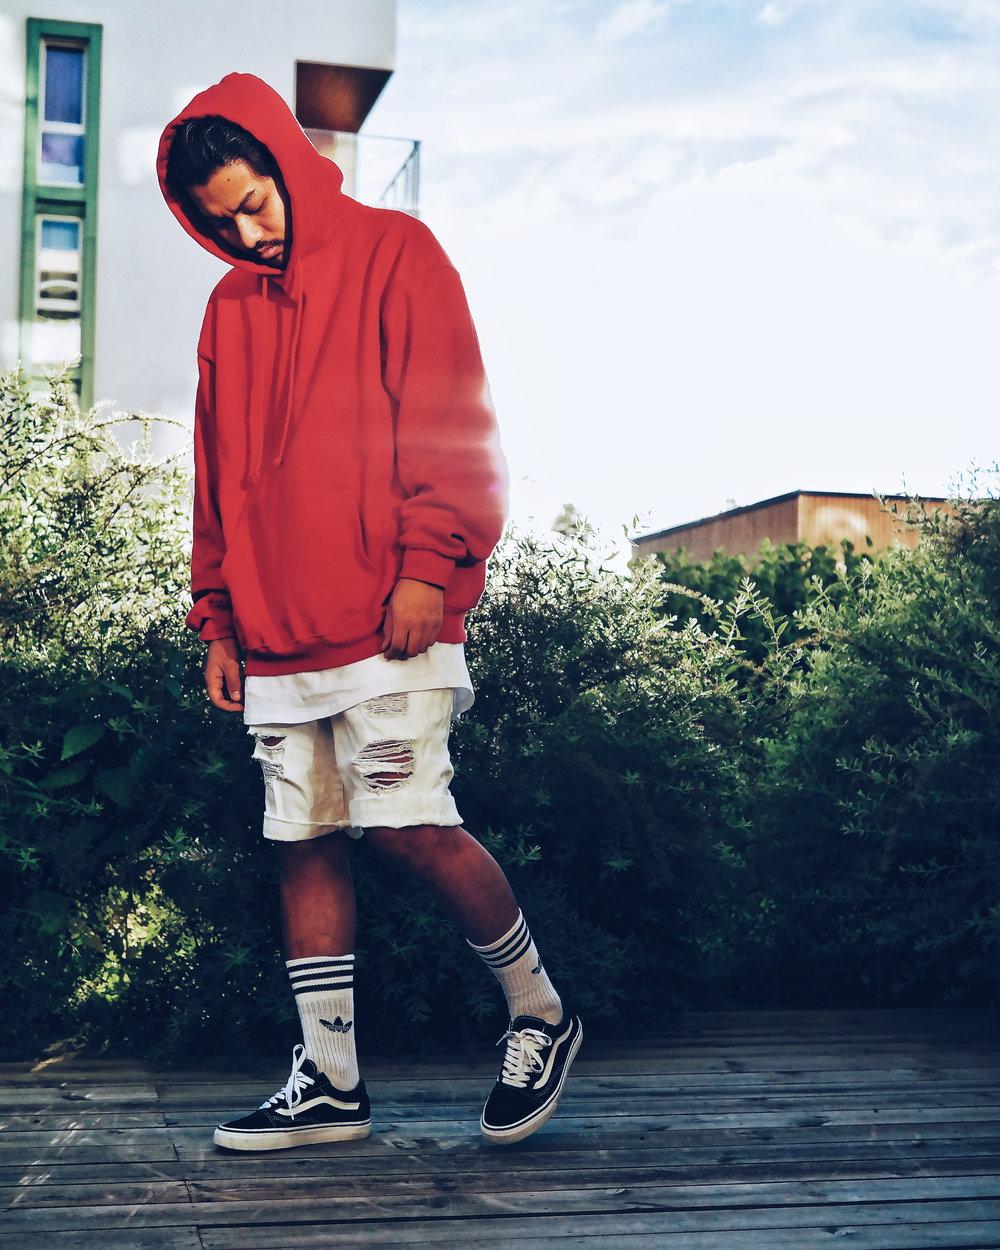 Men's Summer Streetwear,Men's Summer Street Style,Fashion From Norway,Thai Fashion Blogger,July Fashion,Summer Fashion Inspiration,Men's Street Outfits,European Street Style,Teddy Upacut 2